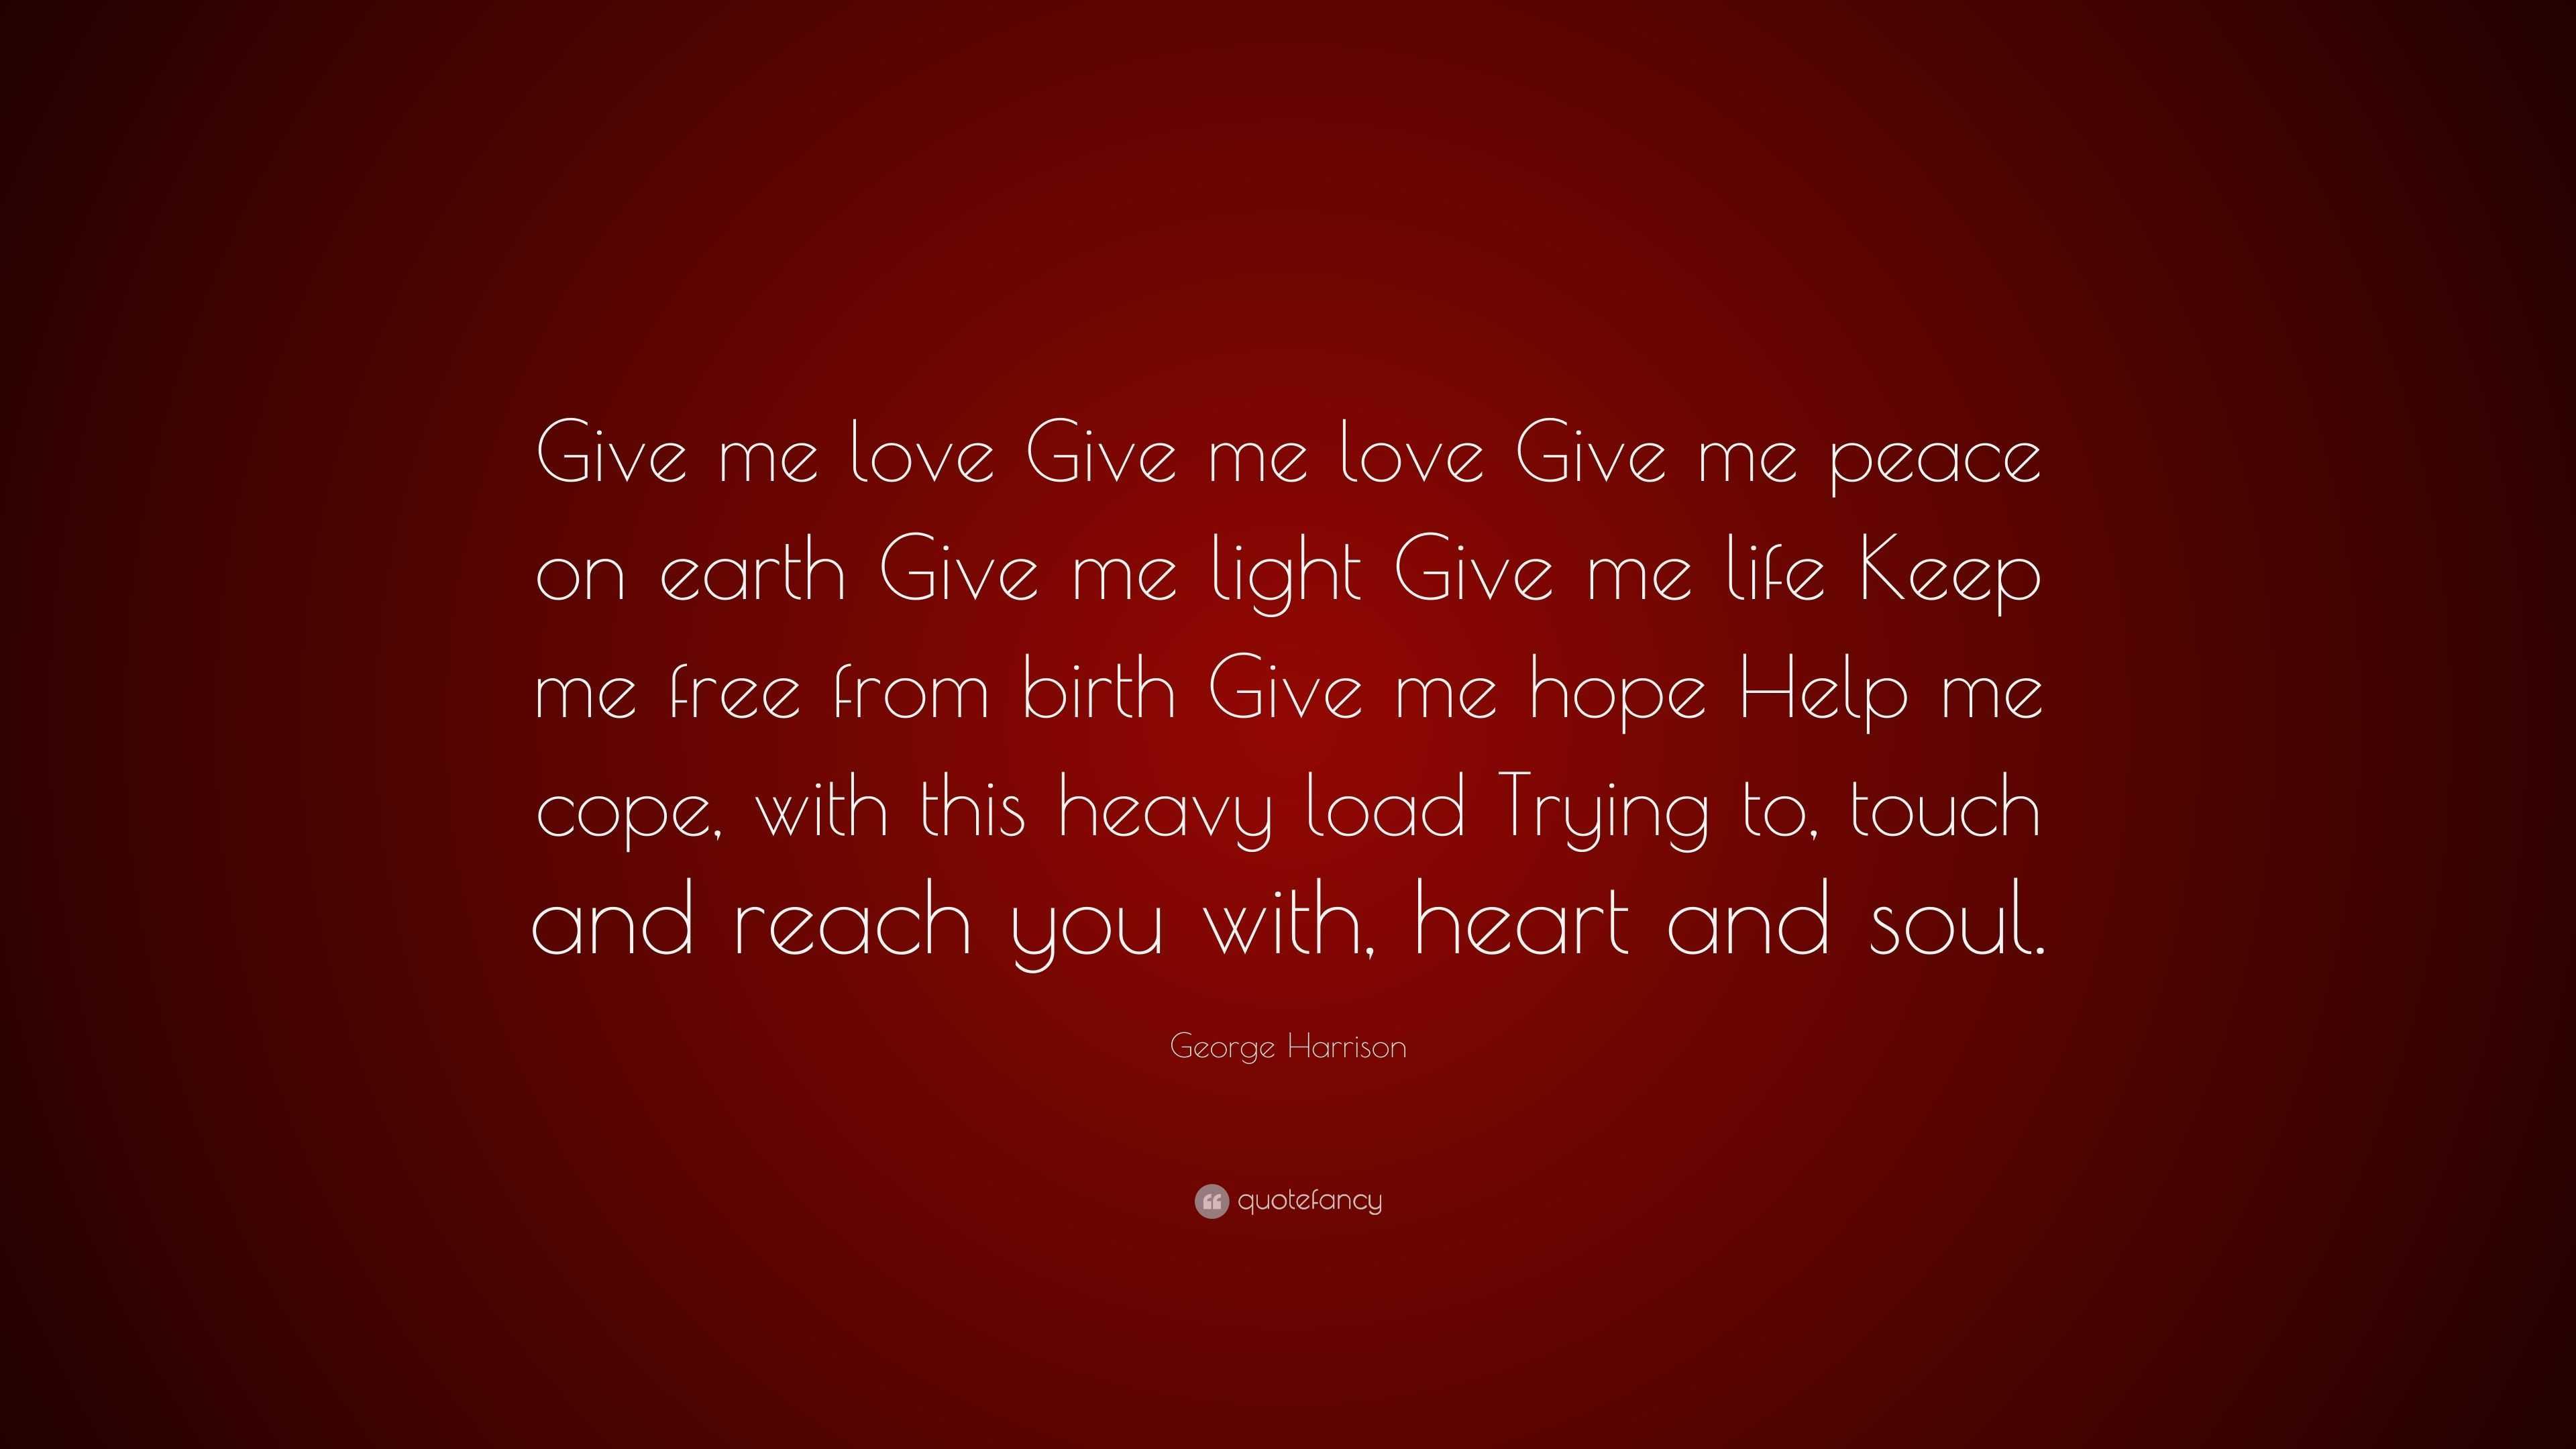 George Harrison Quote: U201cGive Me Love Give Me Love Give Me Peace On Earth